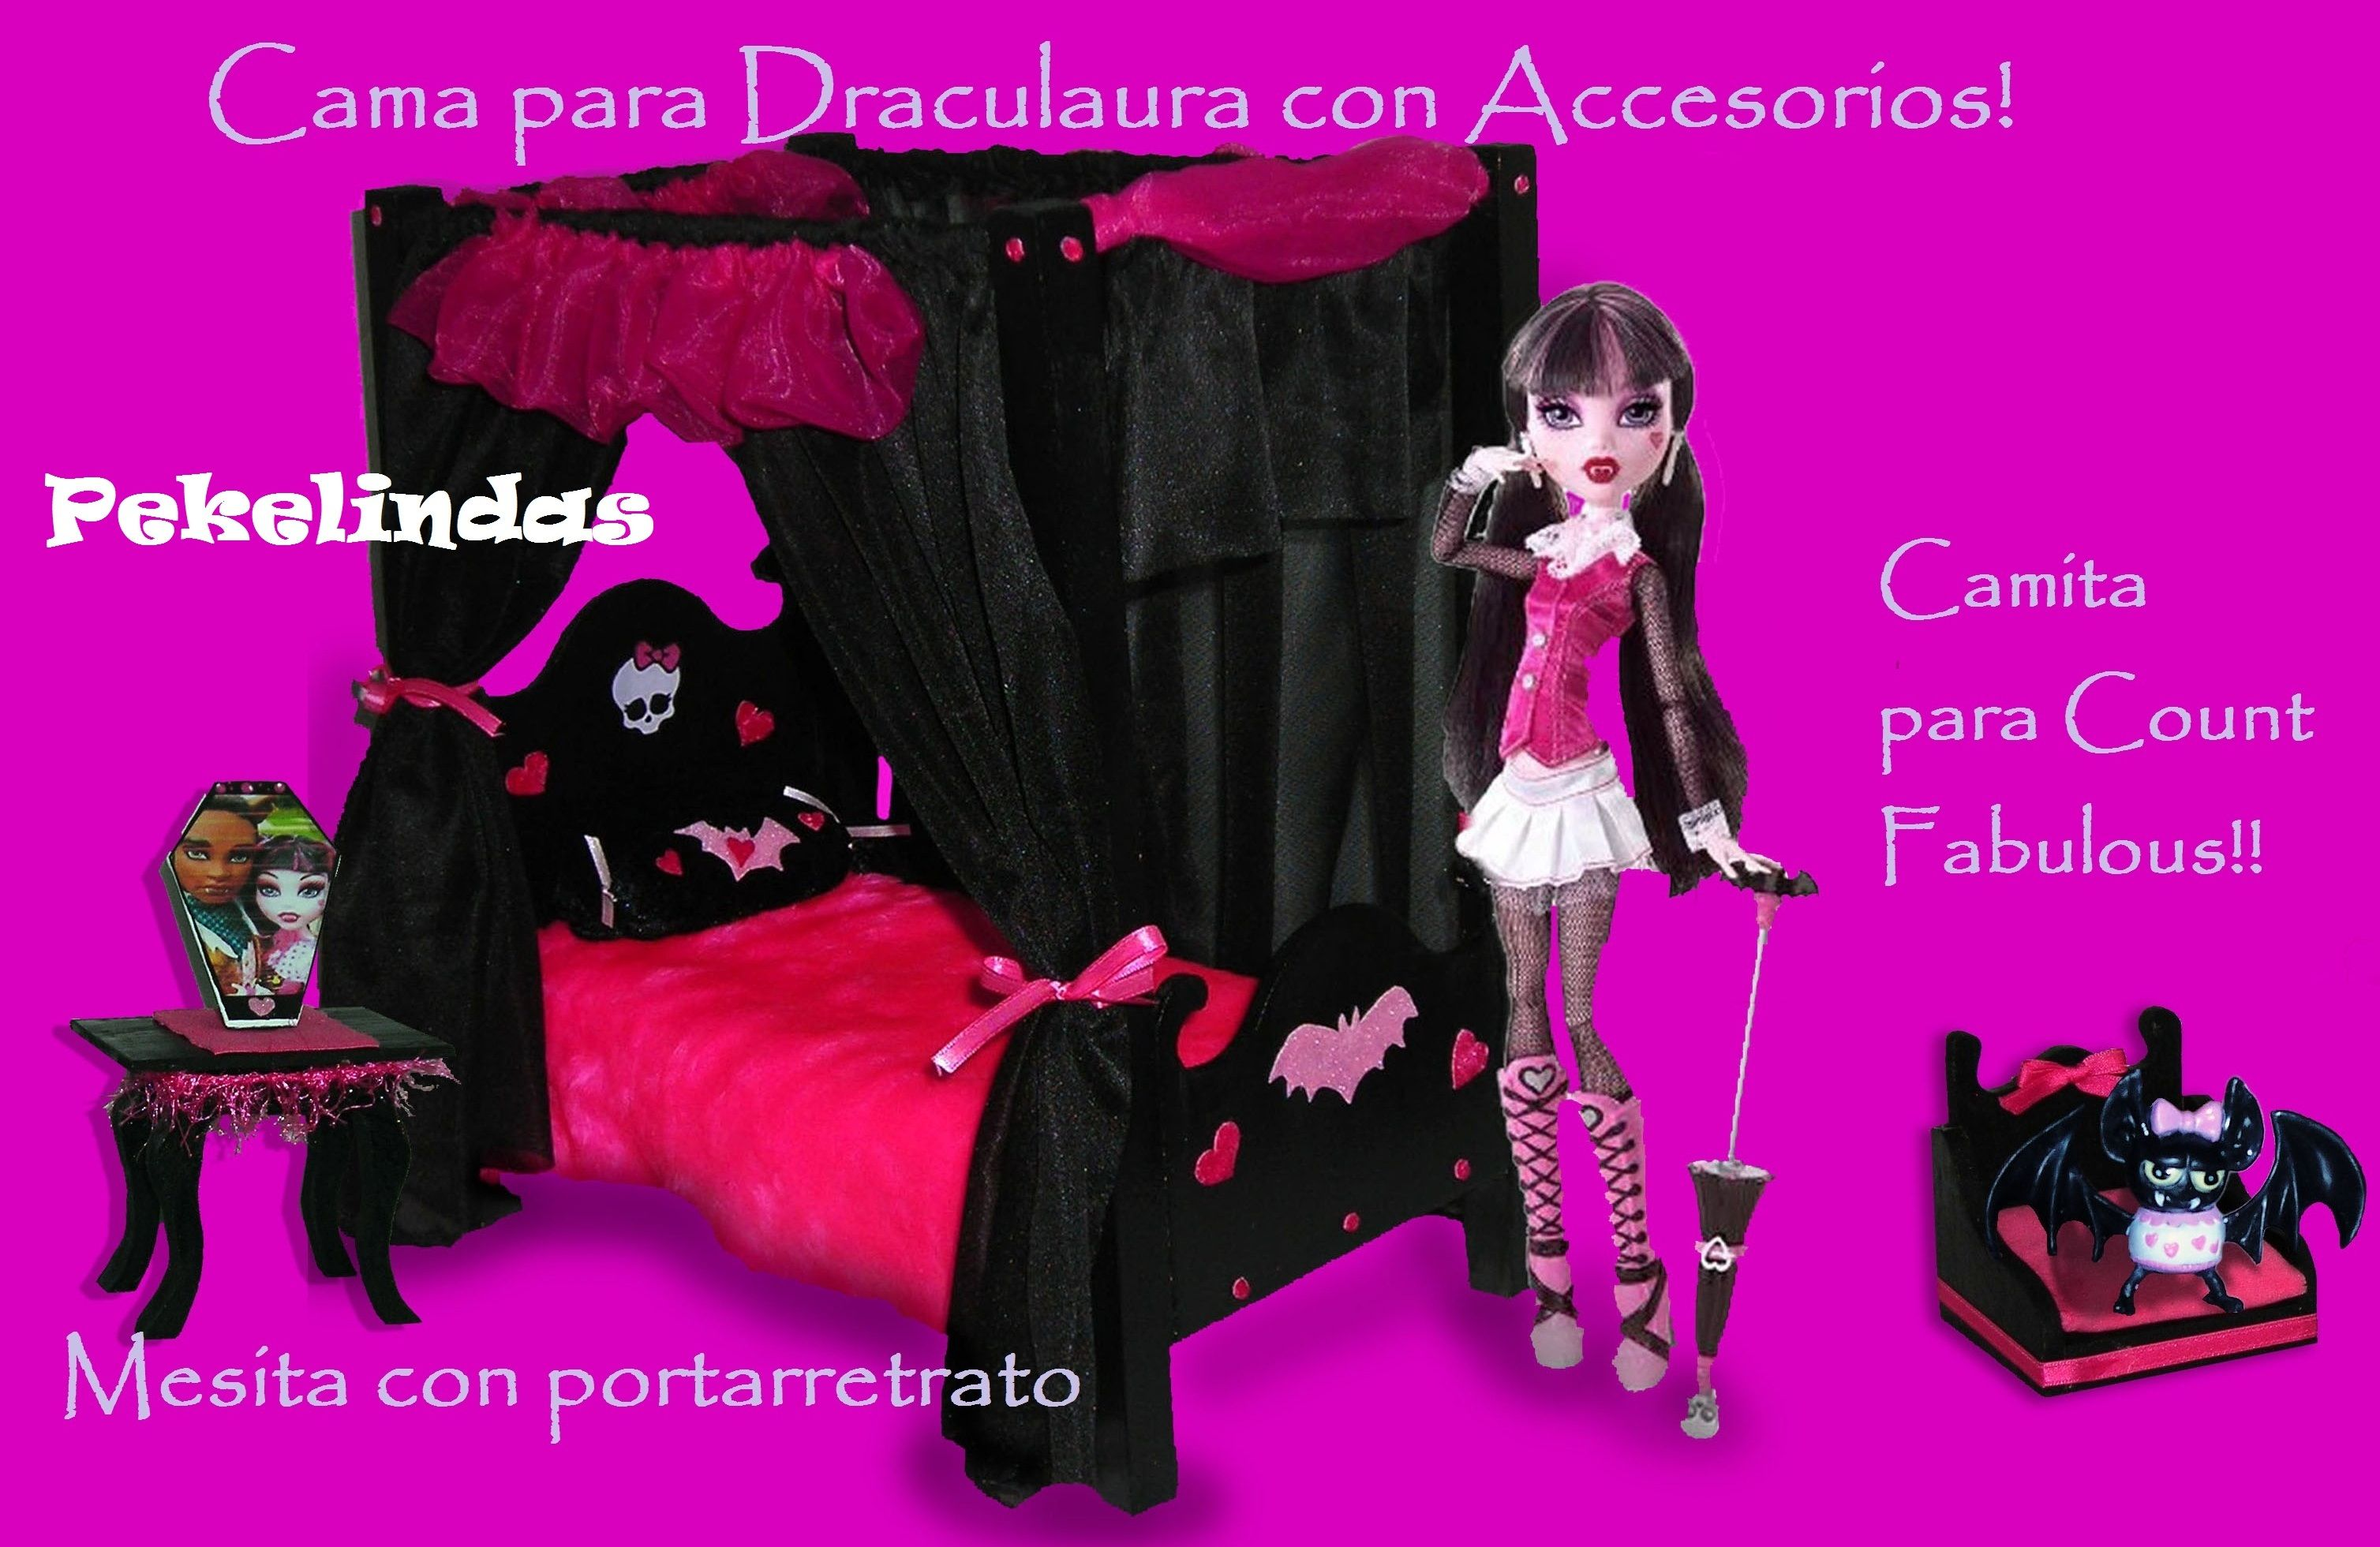 Nueva cama con accesorios para draculaura camitas para - Camas monster high ...